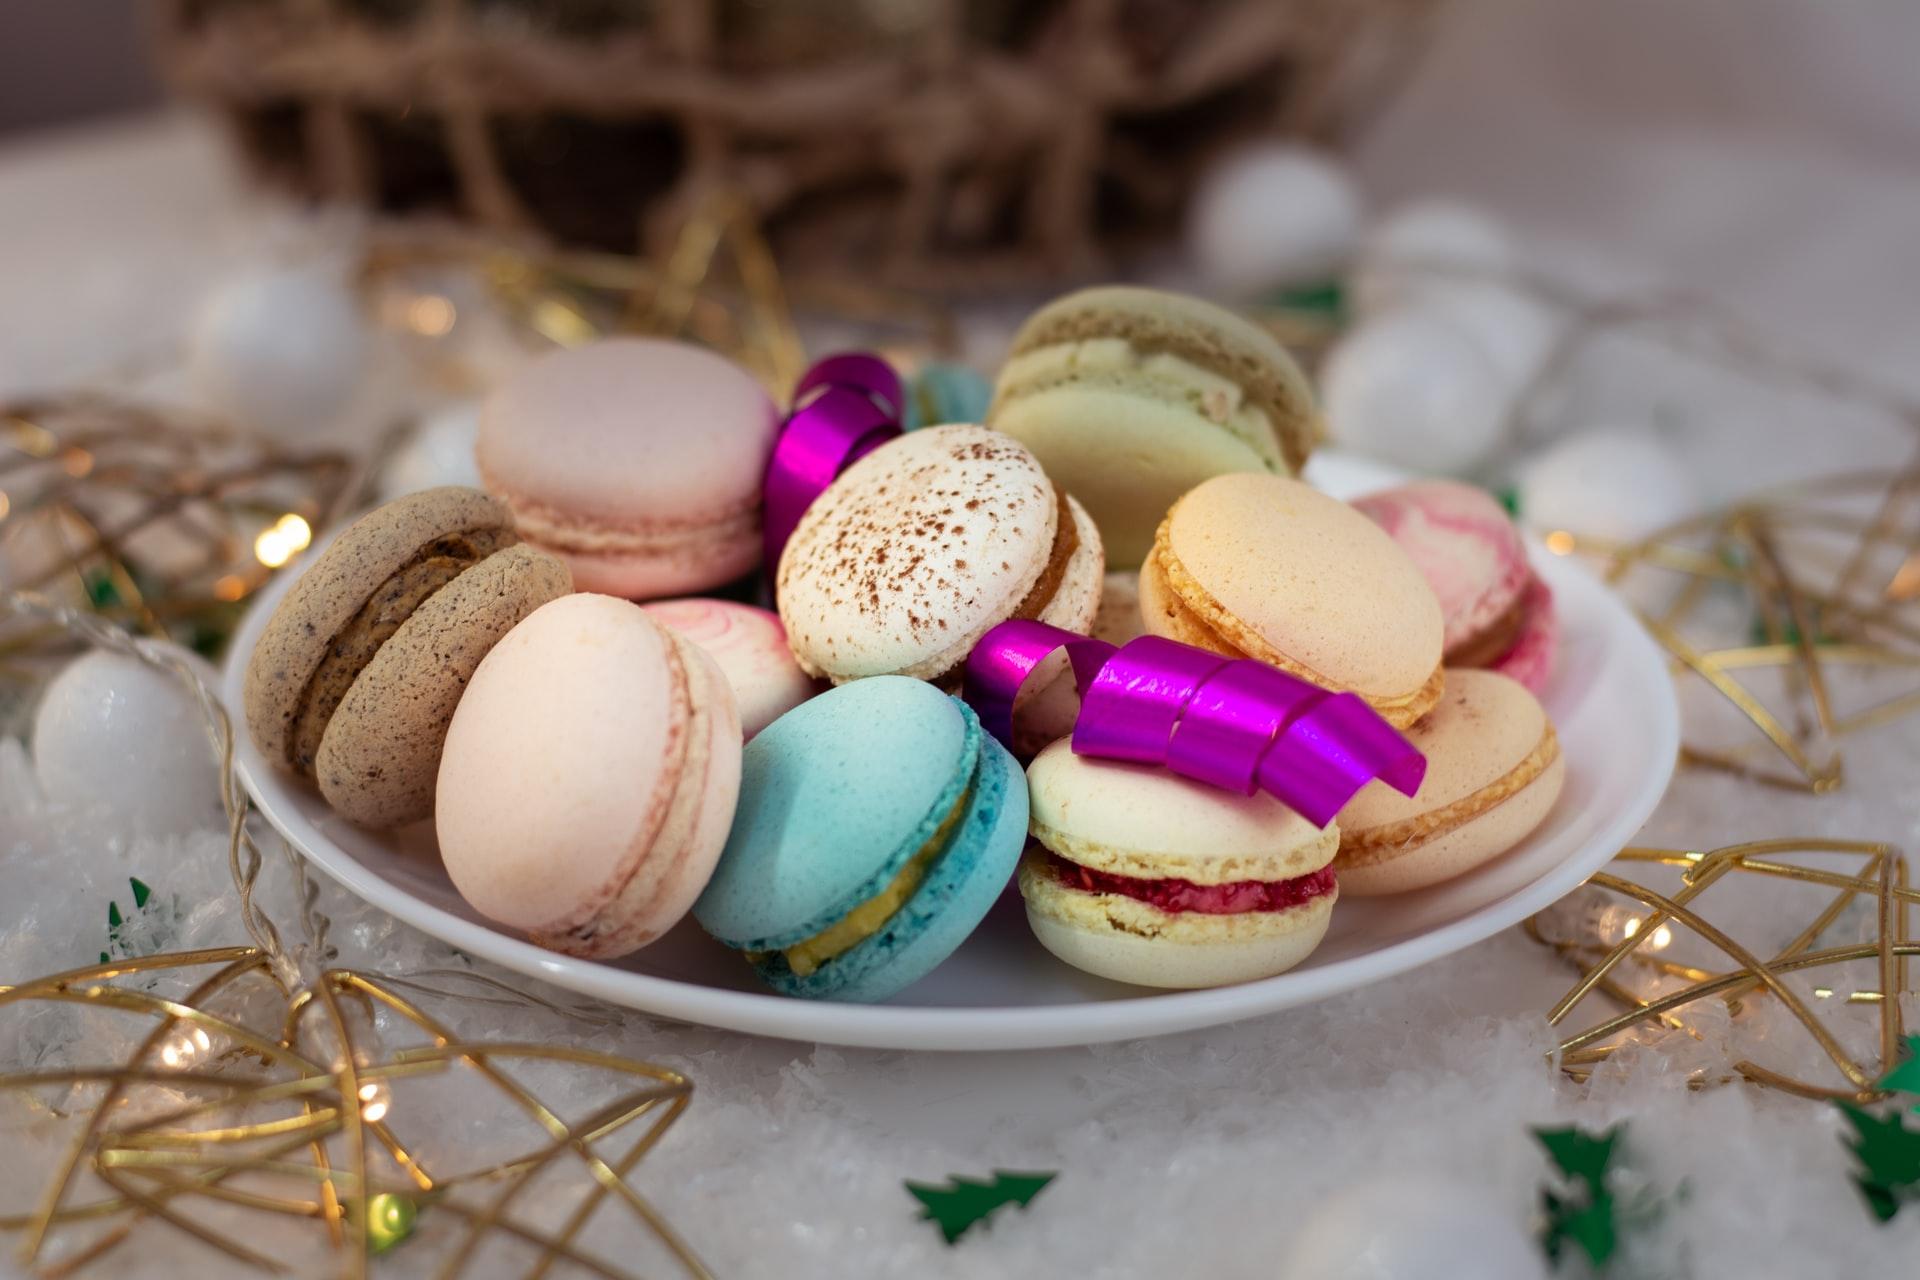 The 2020 NYC Christmas Food Guide